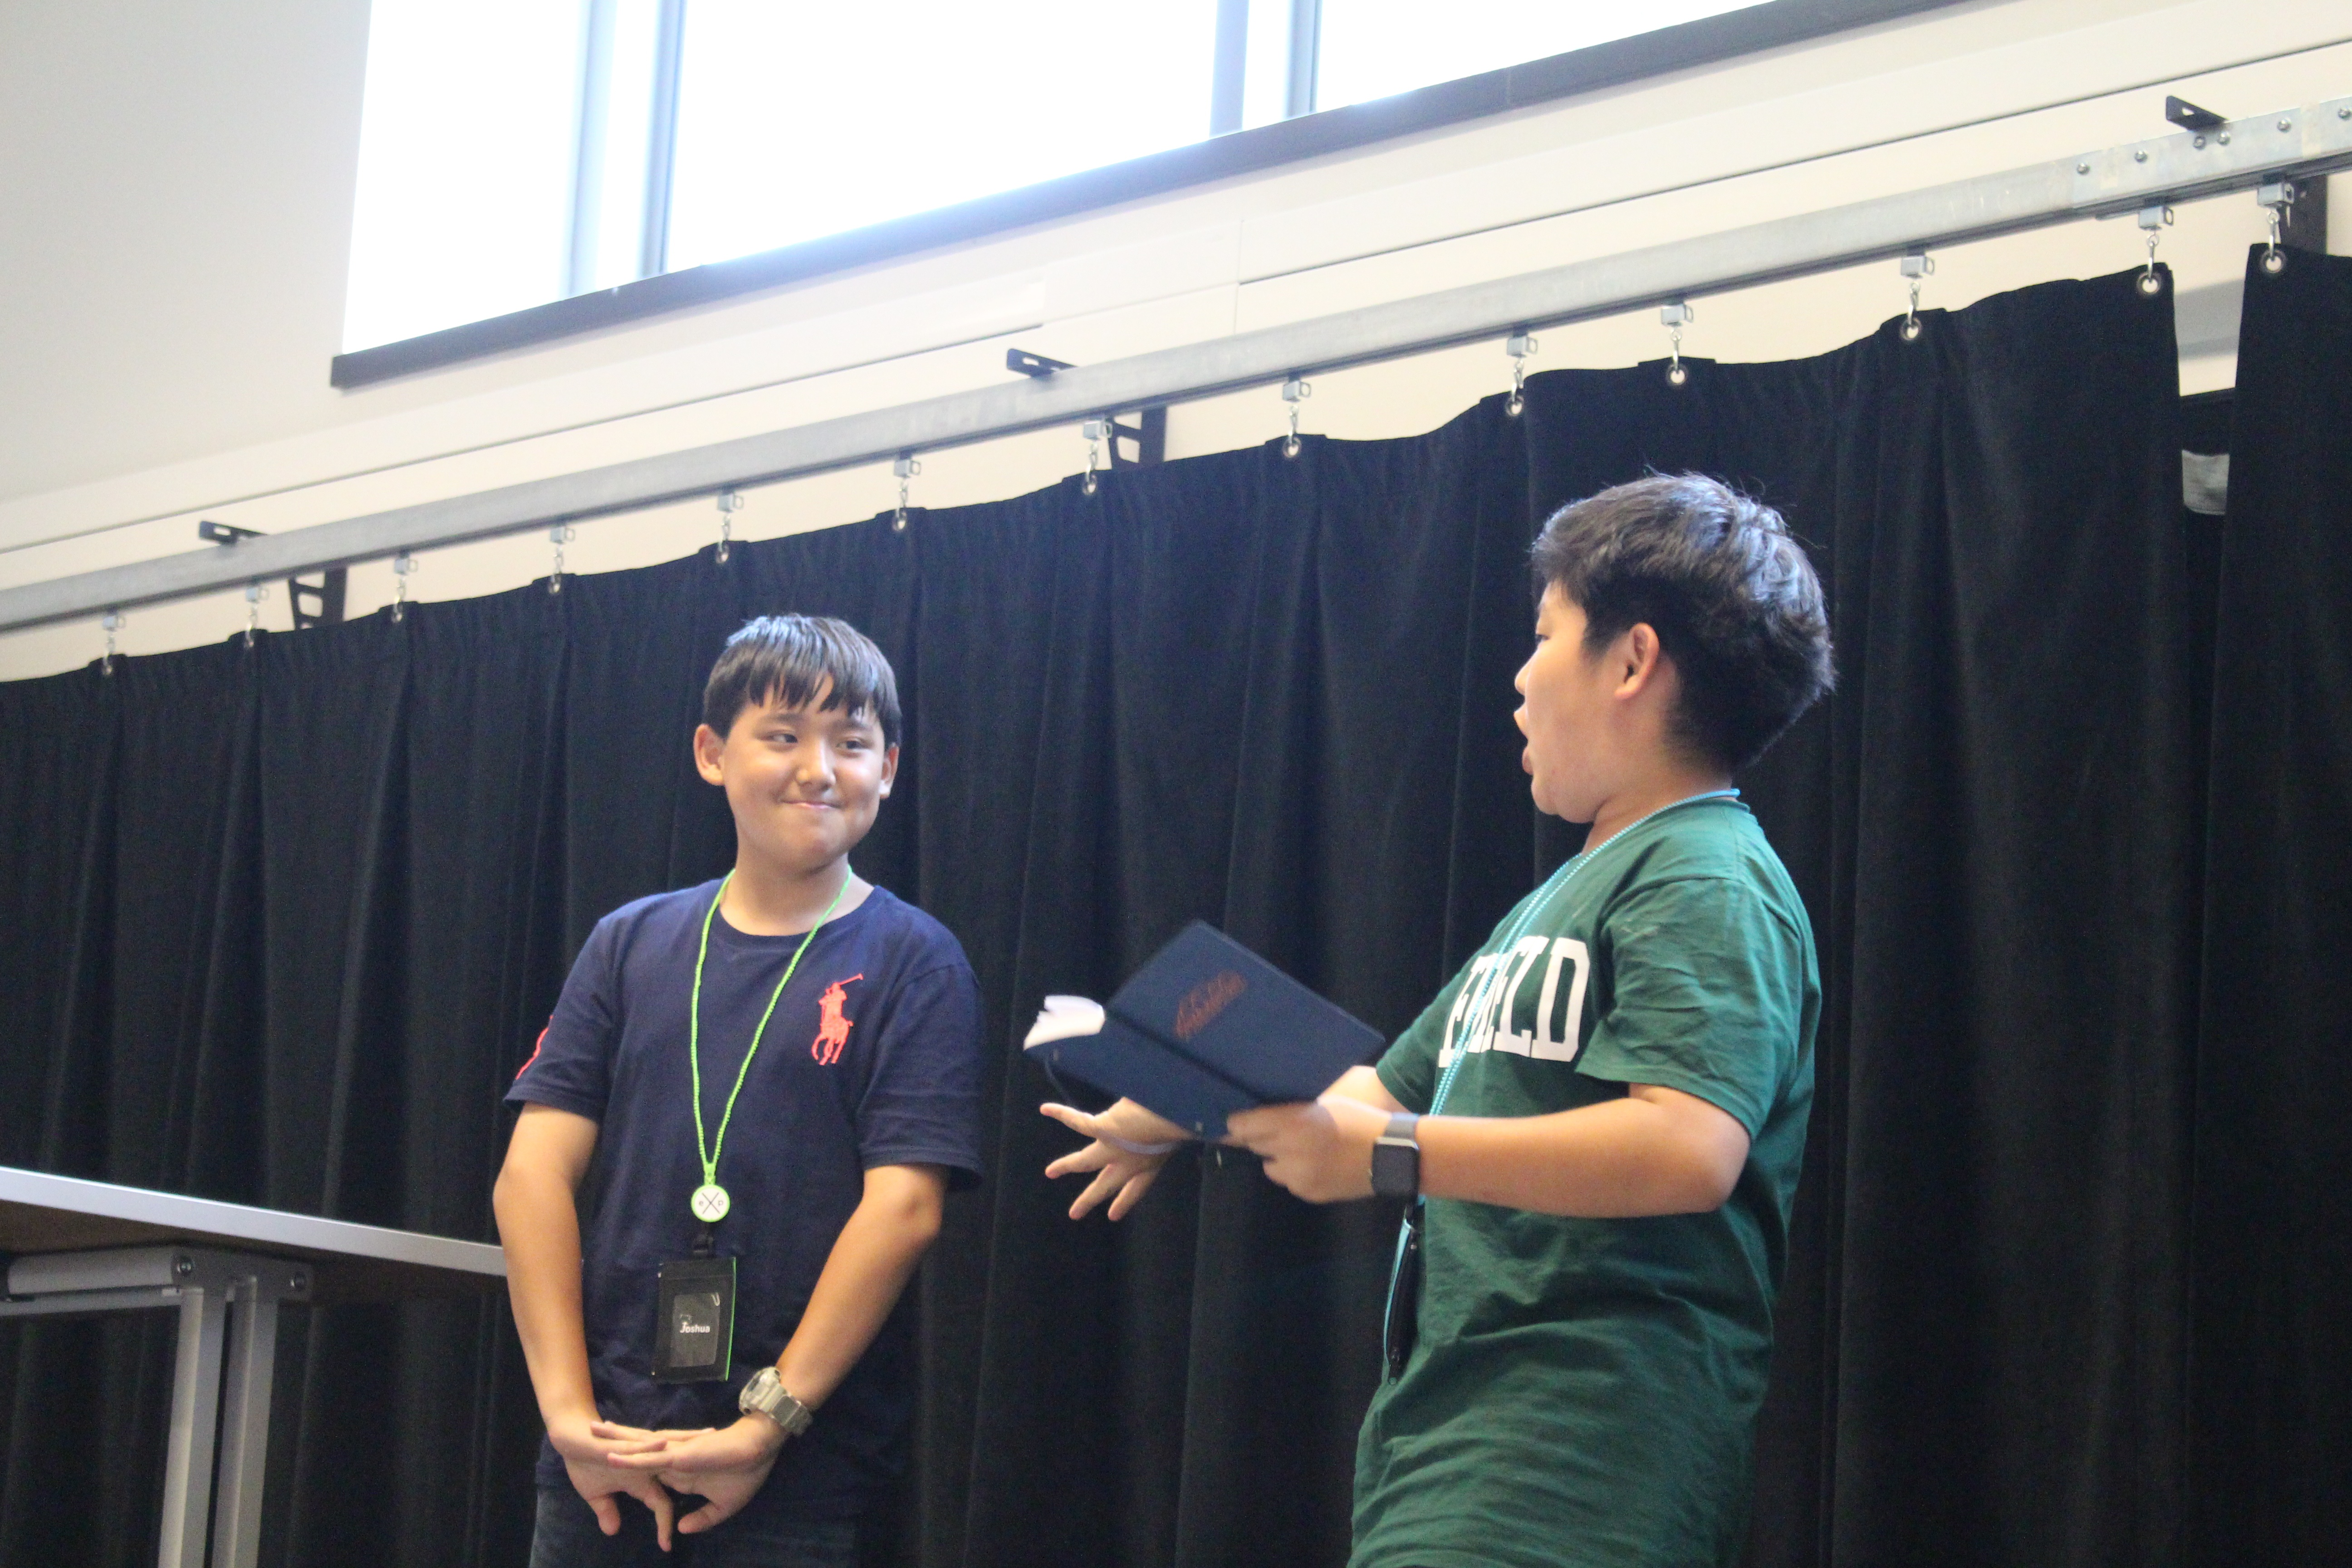 Brandon enthusiastically presents Joshua to his Communications Class.